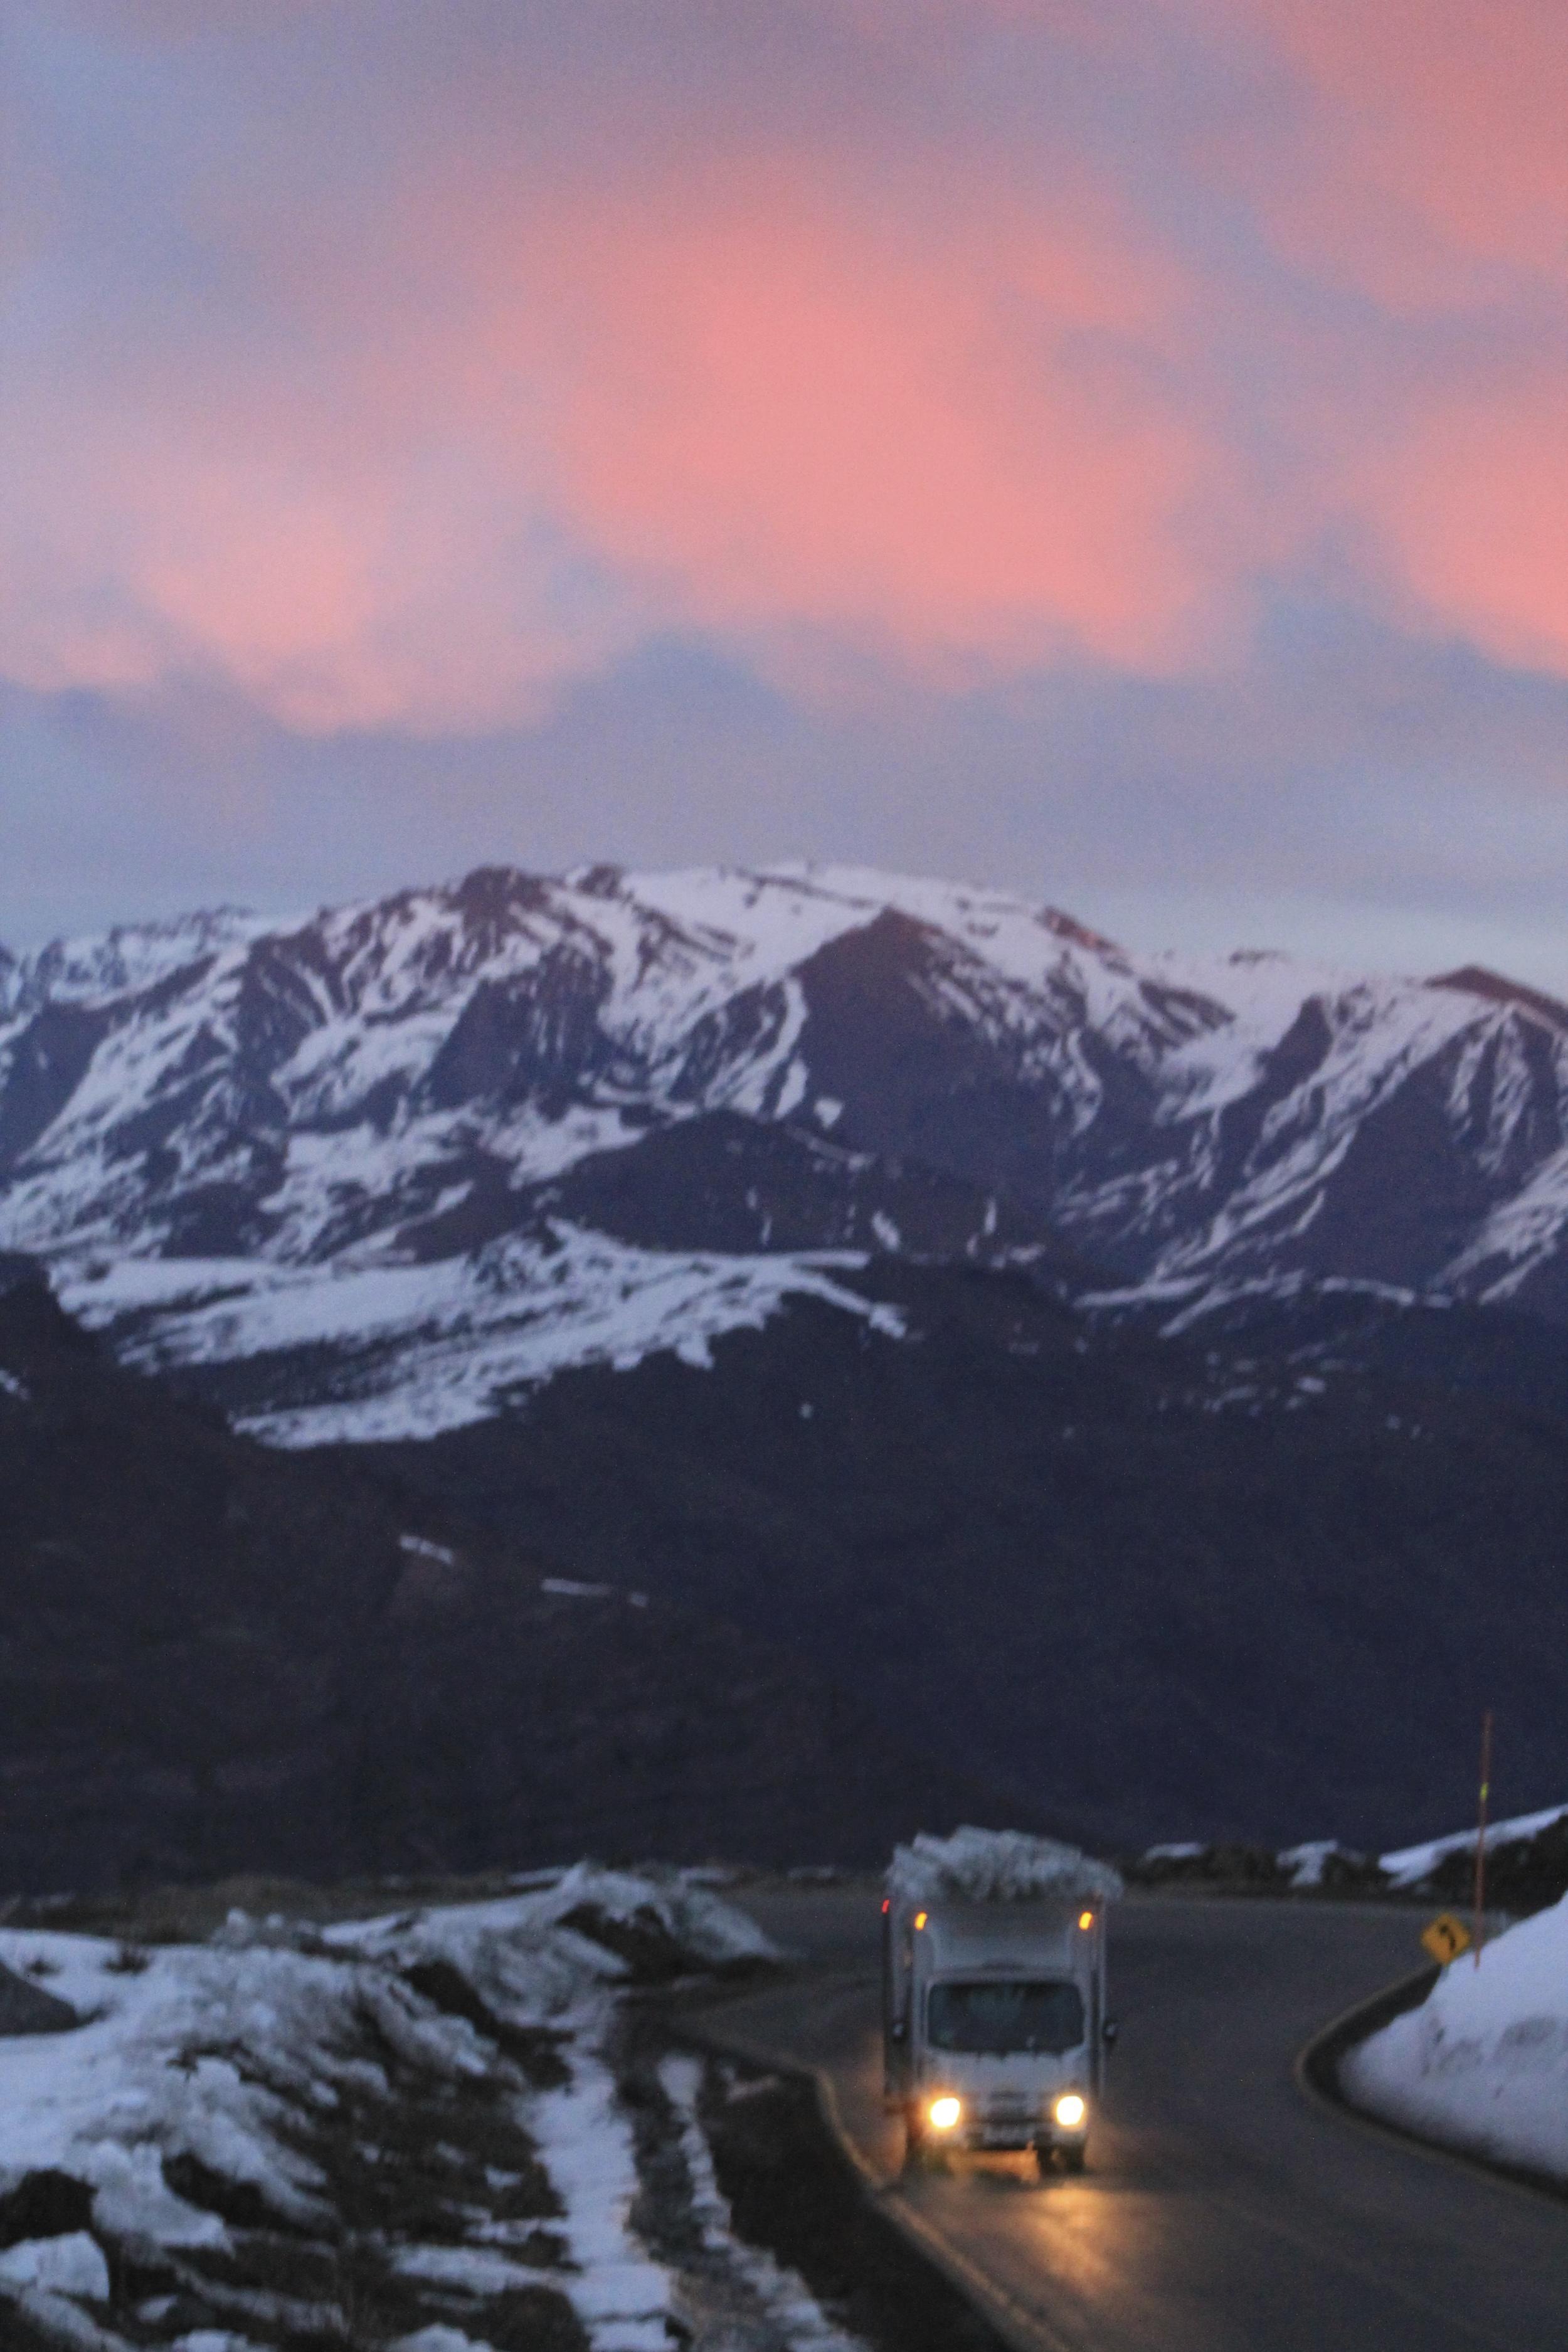 The sun setting on Santa Tere